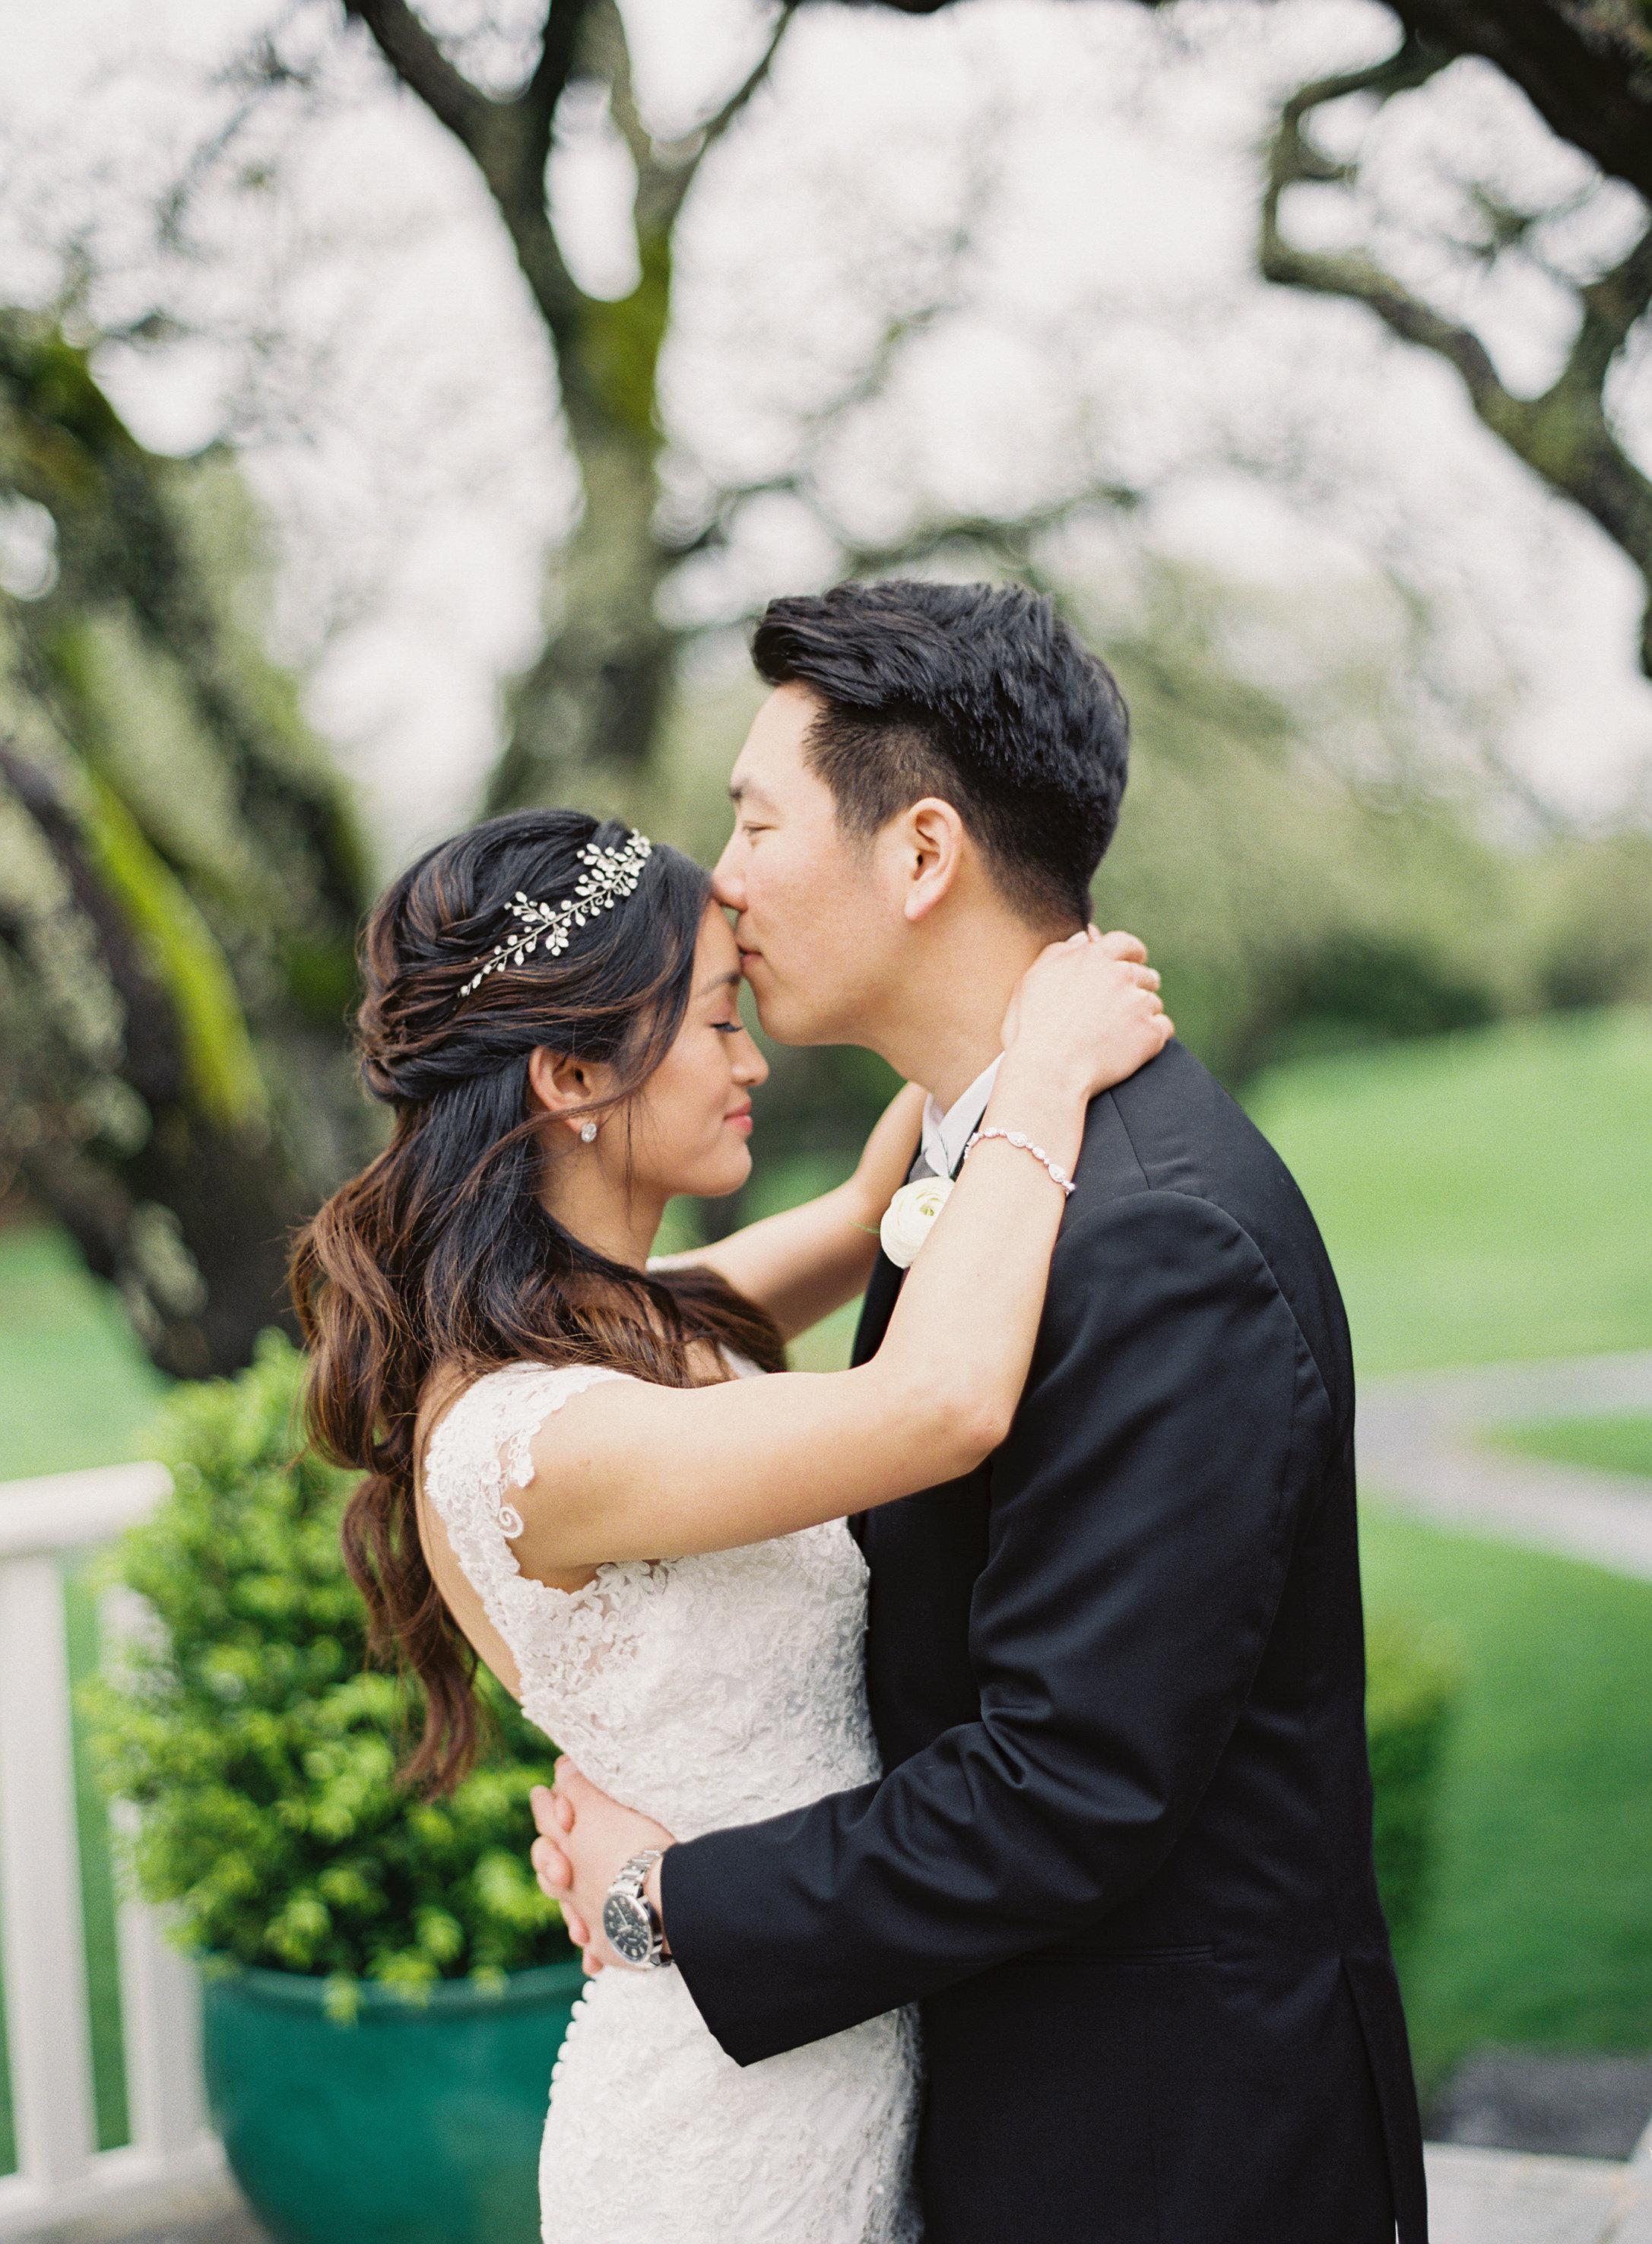 JA_Wedding_Jennifer_Aaron_058.jpg